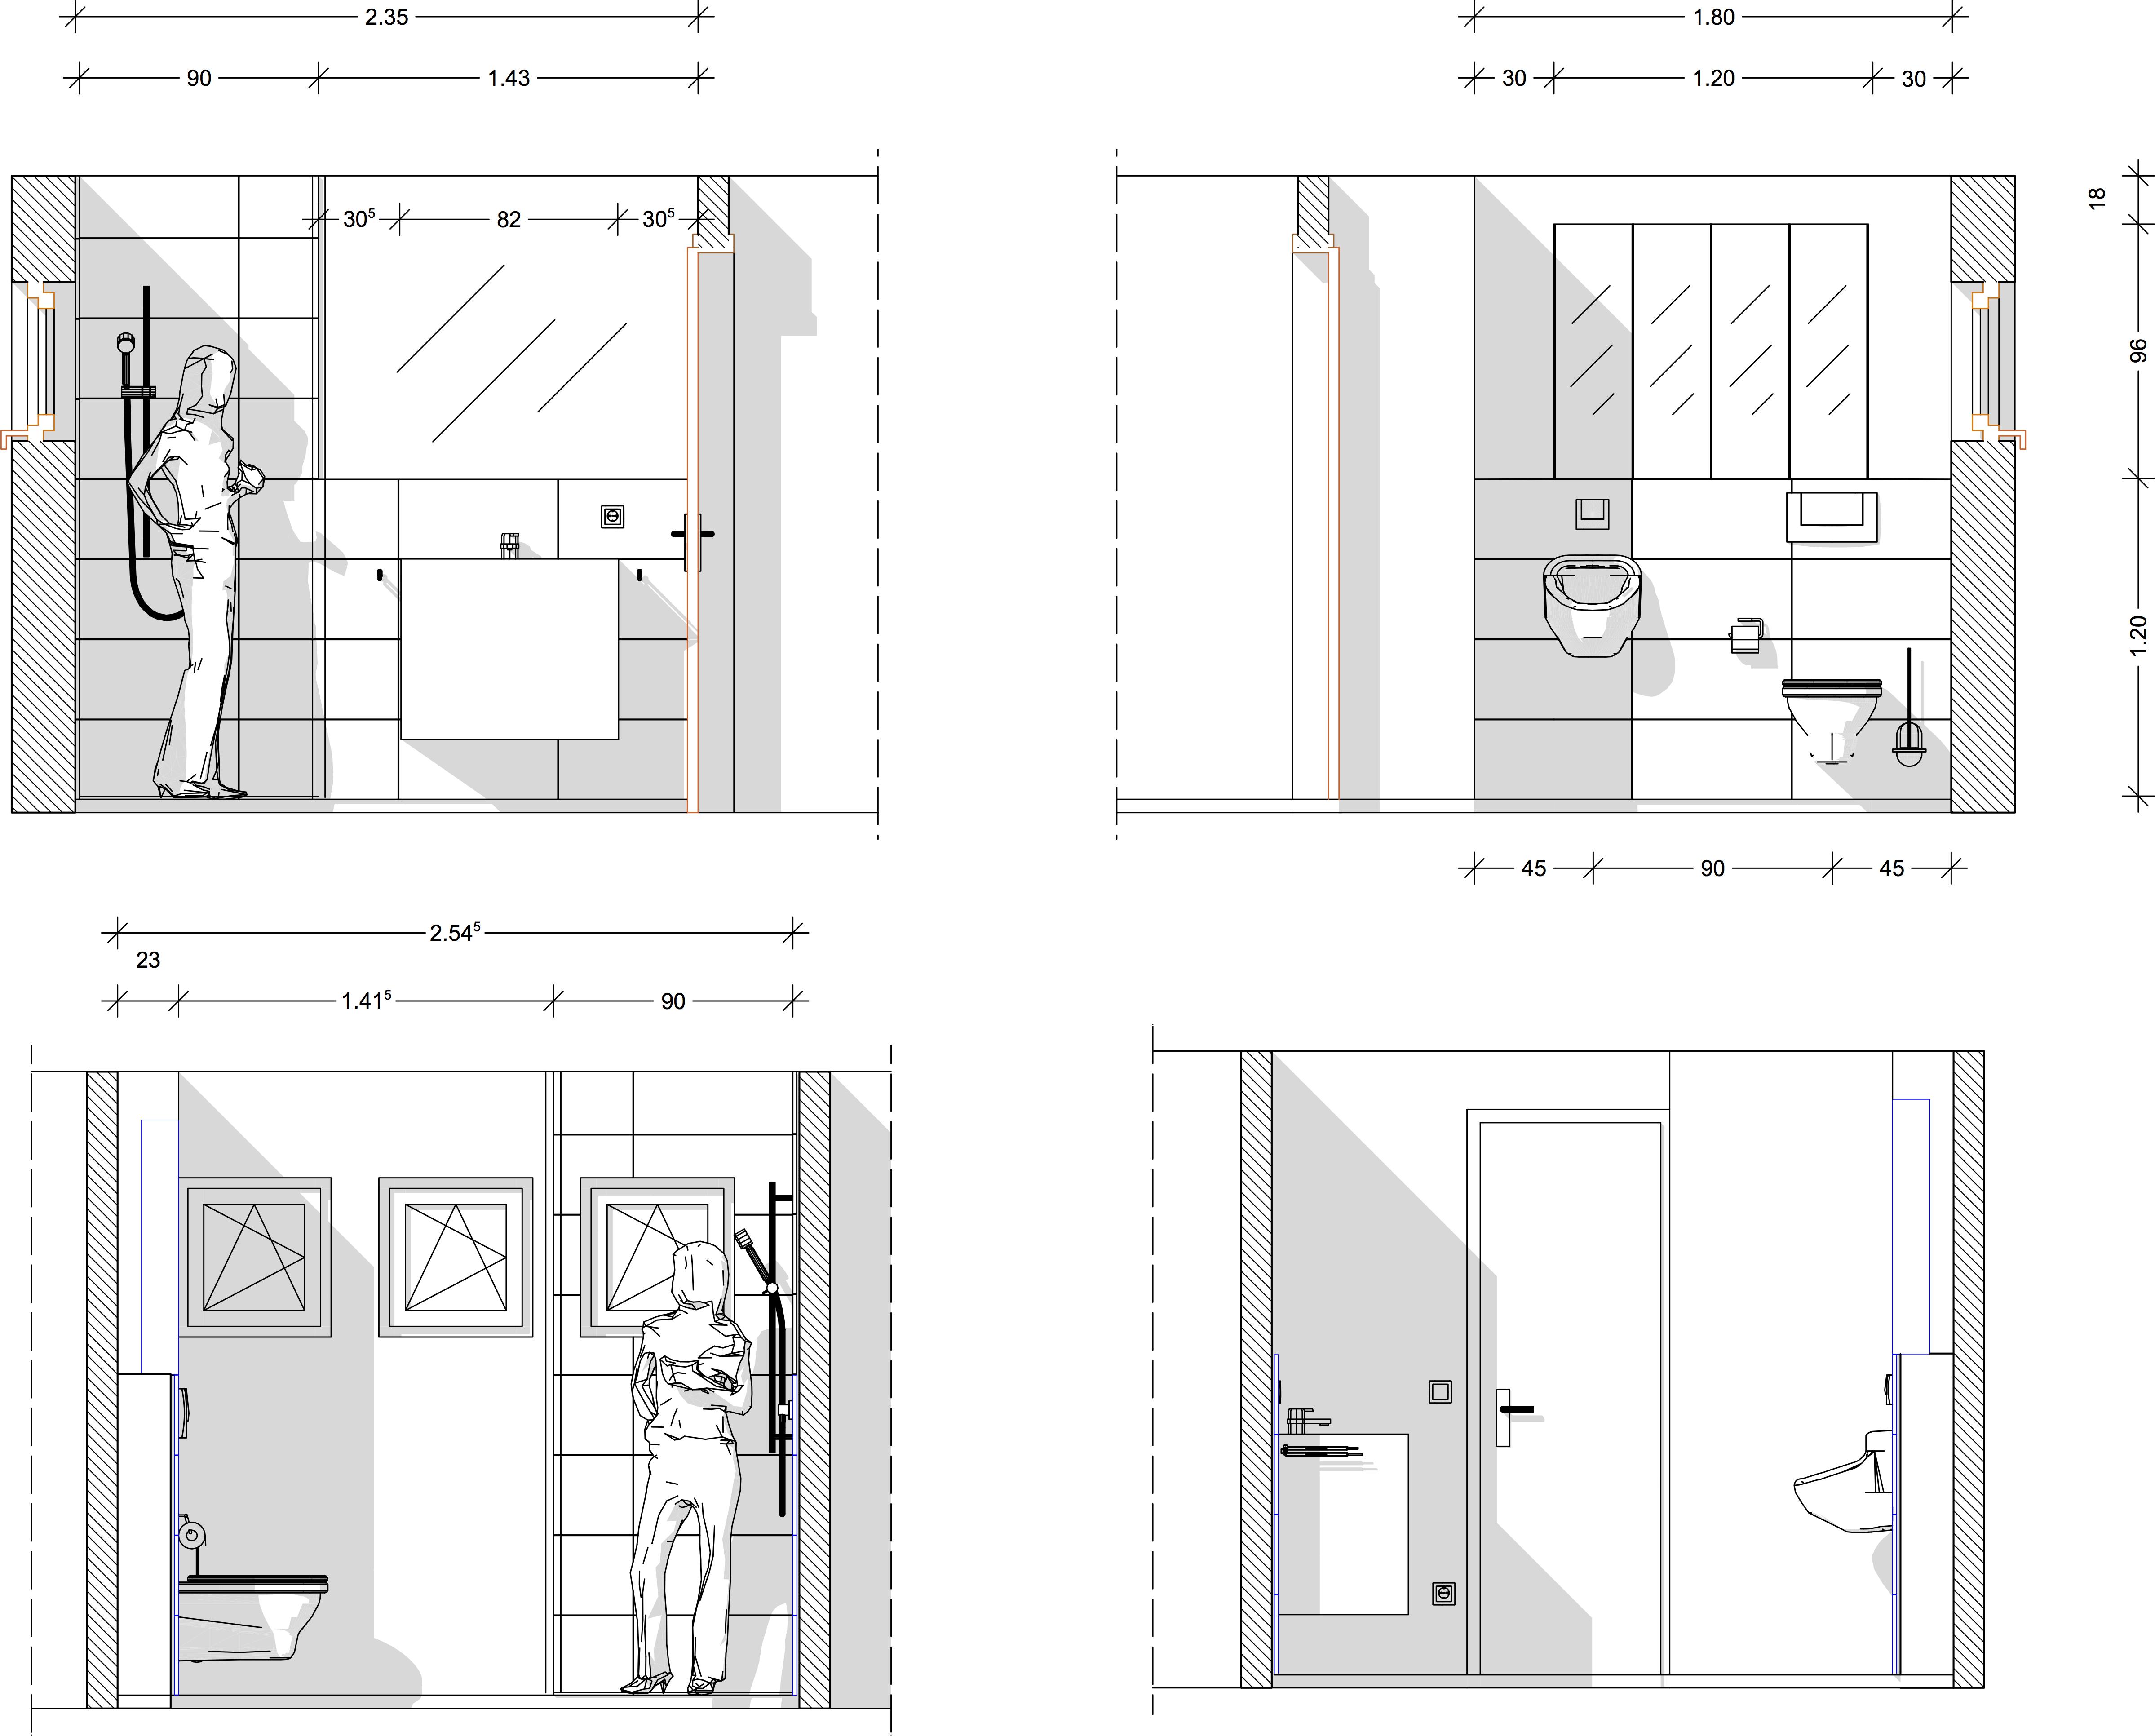 Bad Kirchheim Teck bad umbauten bialon architektur design kunst